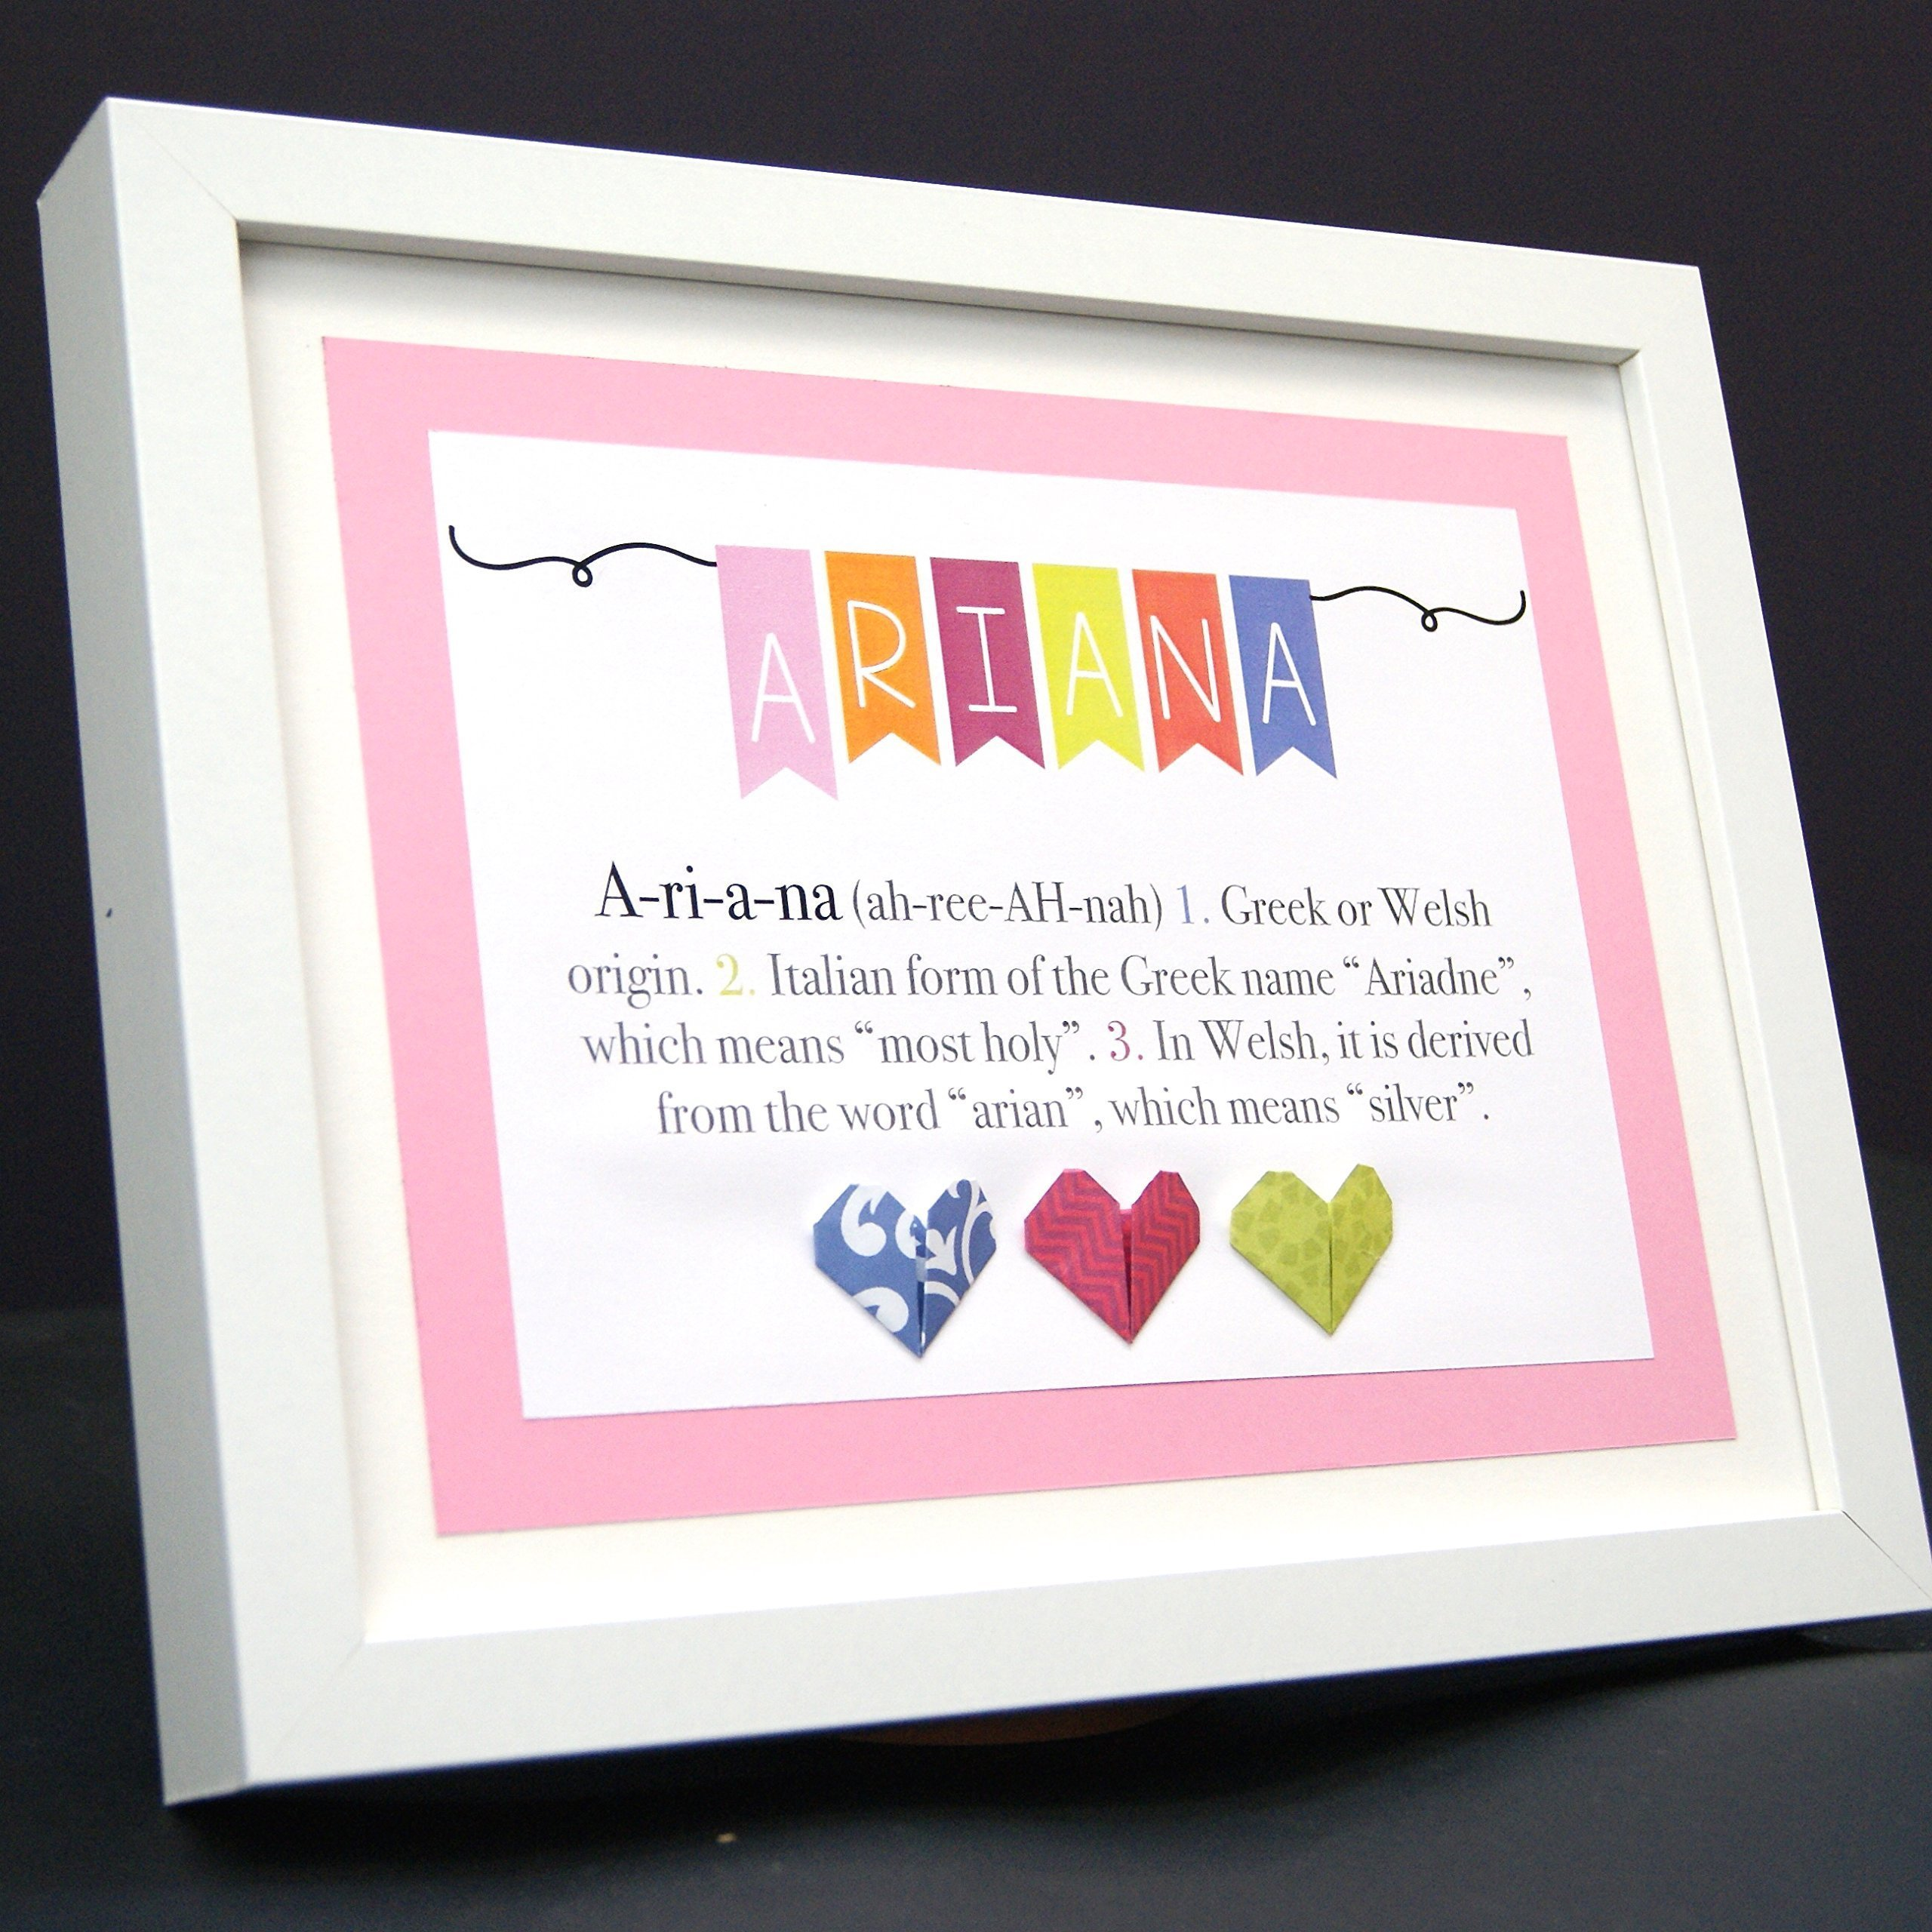 Personalized Name Origin and Meaning Baby Gift Paper Origami Frame with Name Origin and Meaning Custom Newborn Baby Shower Girl Gift